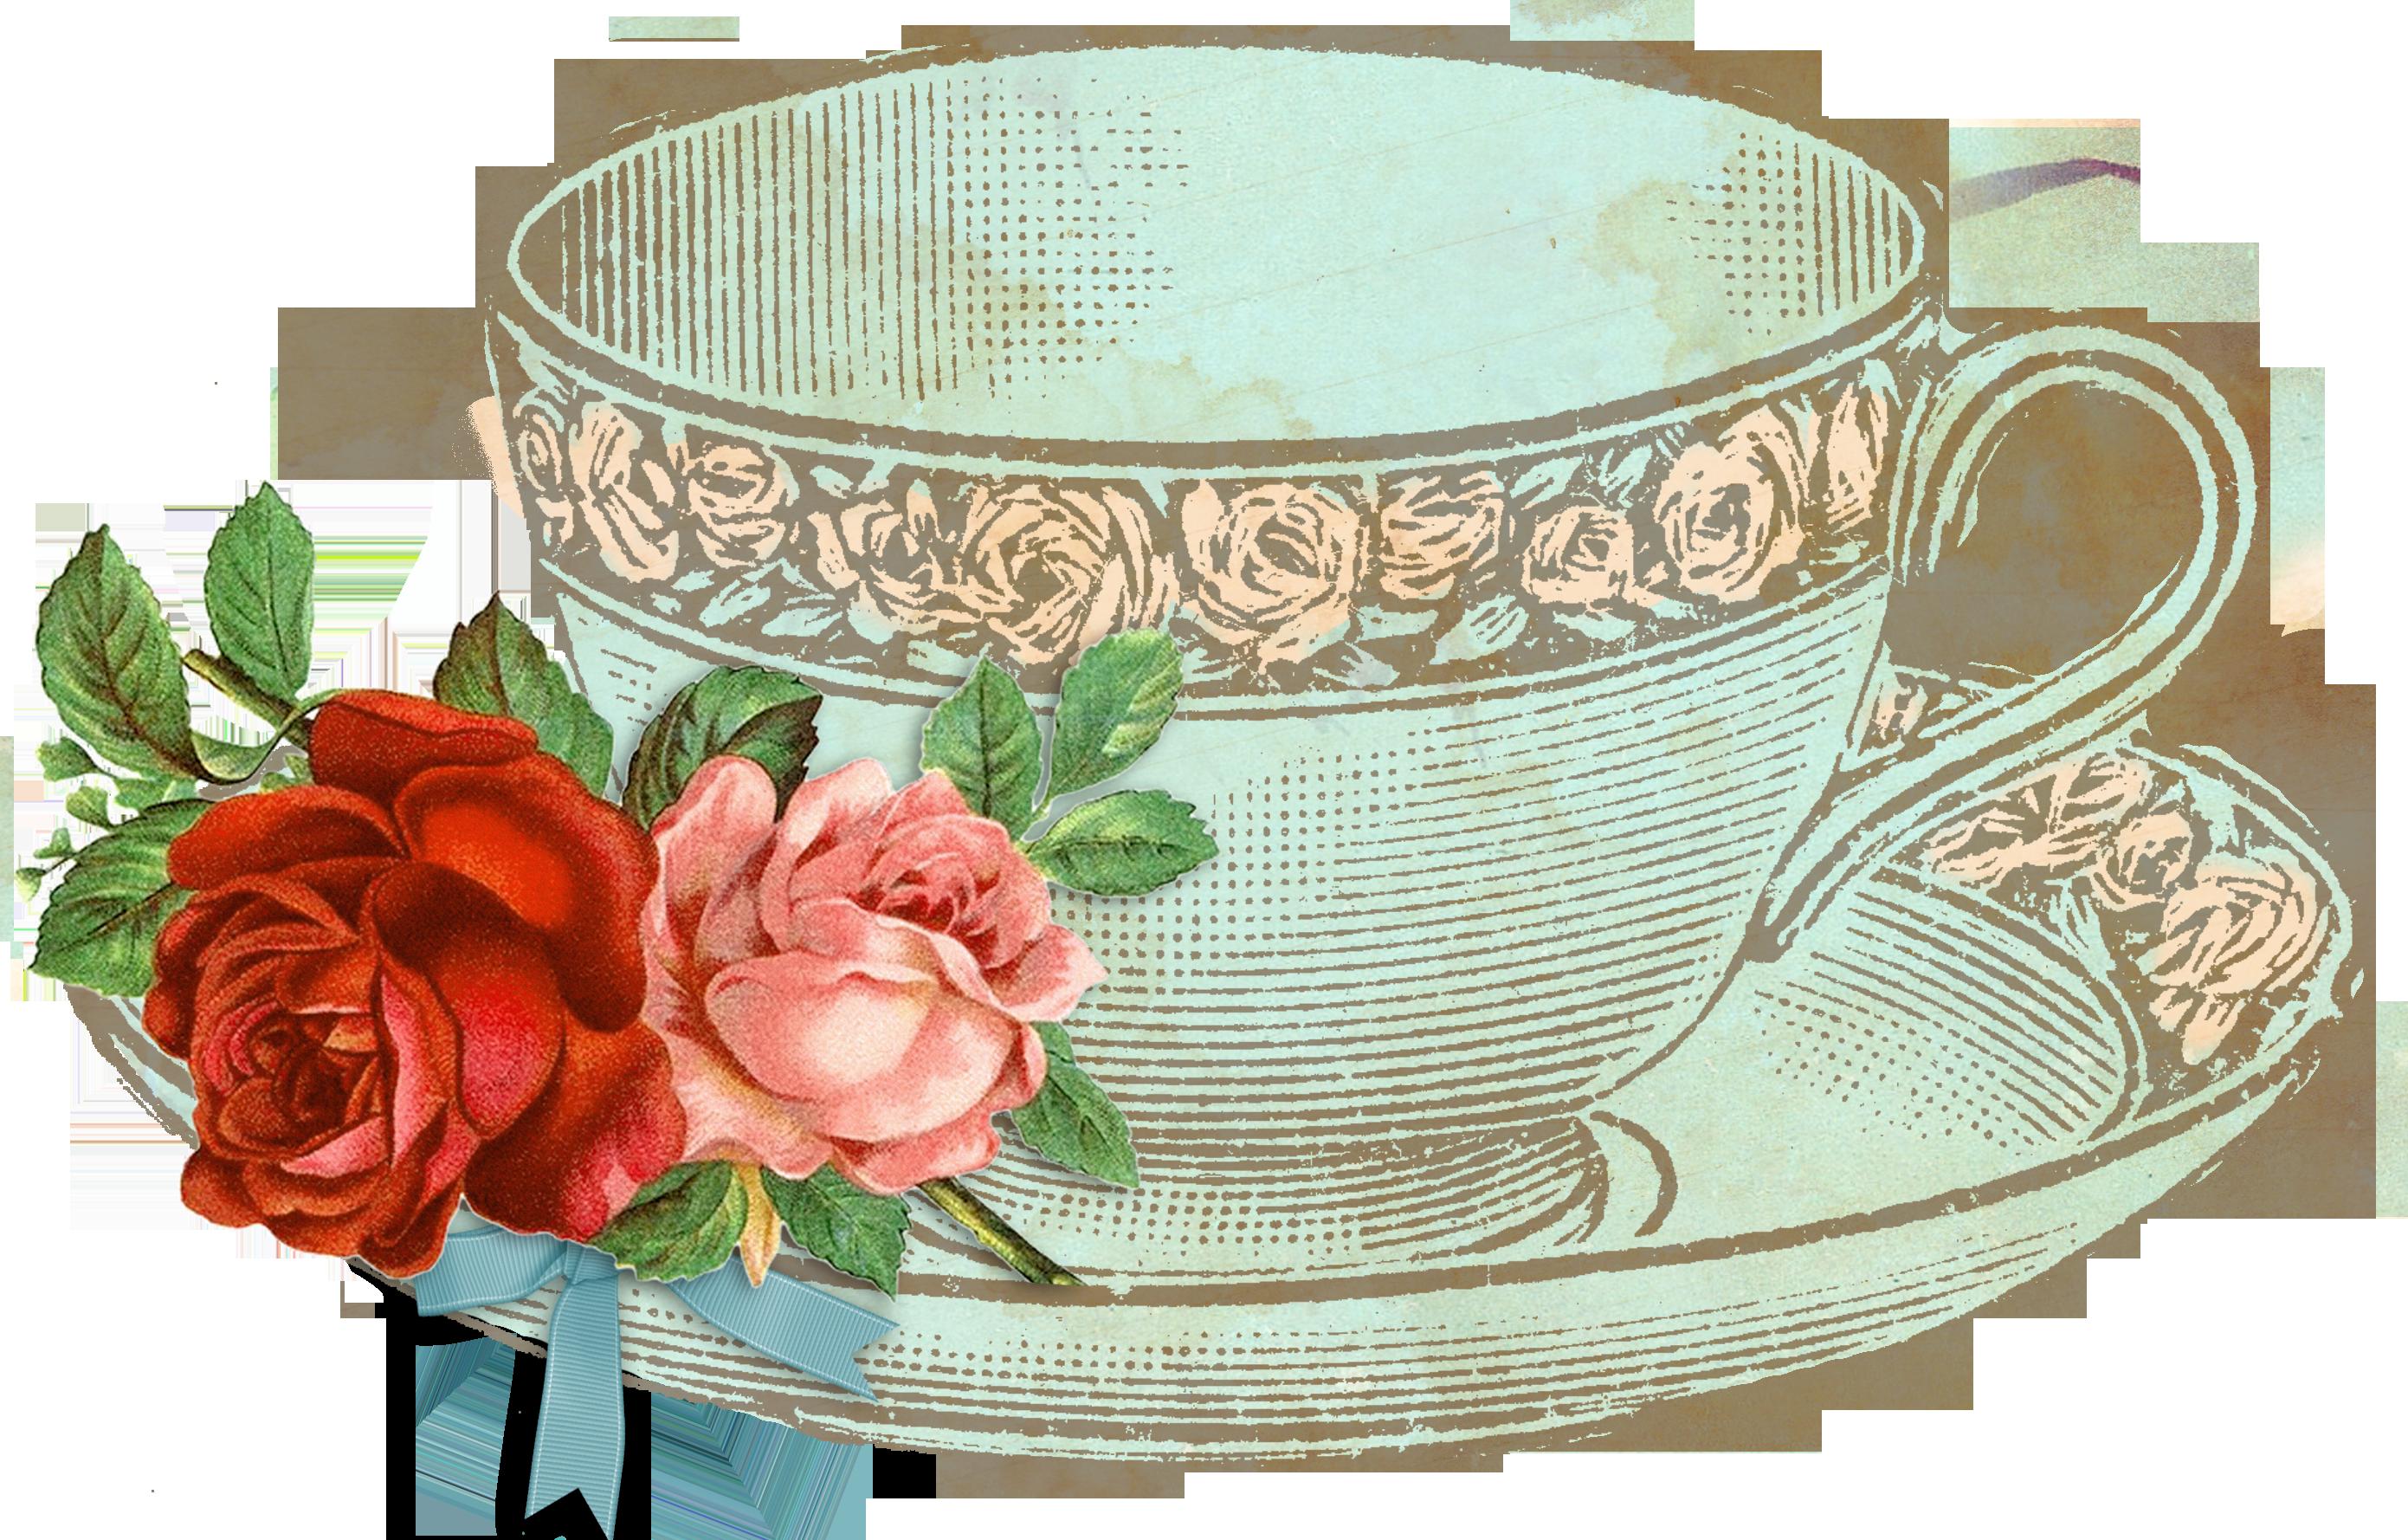 jpg freeuse library  c b ddc. Vintage teacup clipart